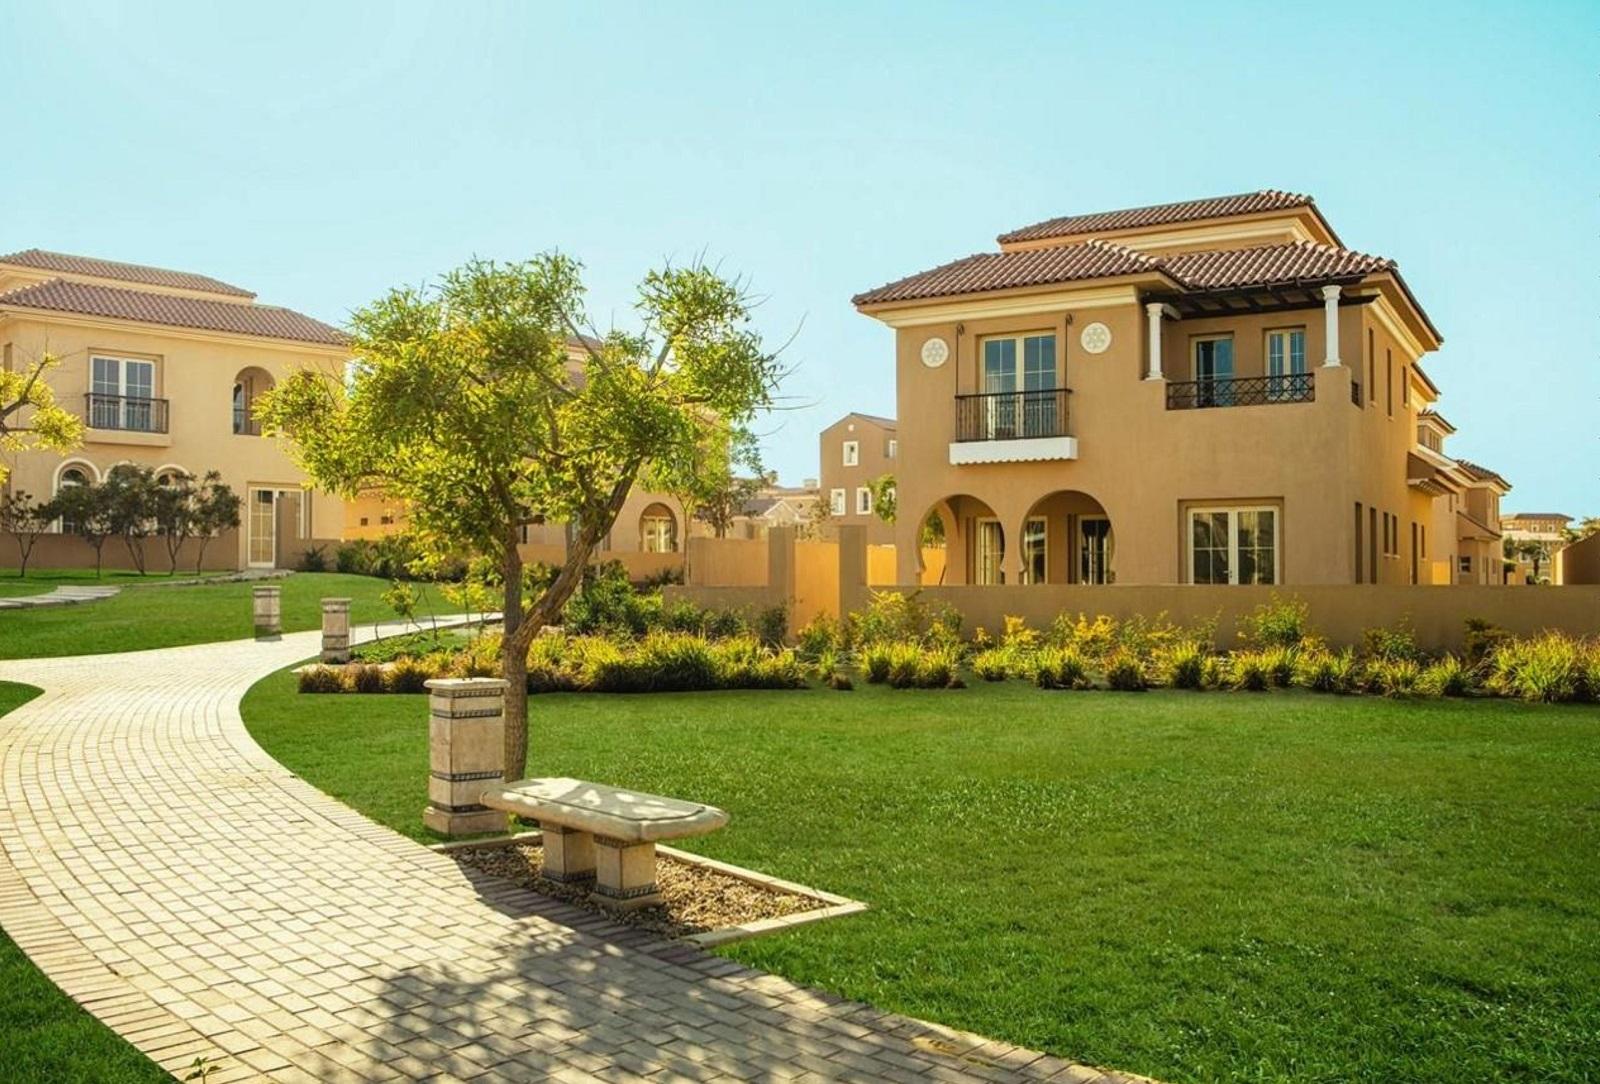 Villas-For-Sale-in-HYDE-Park